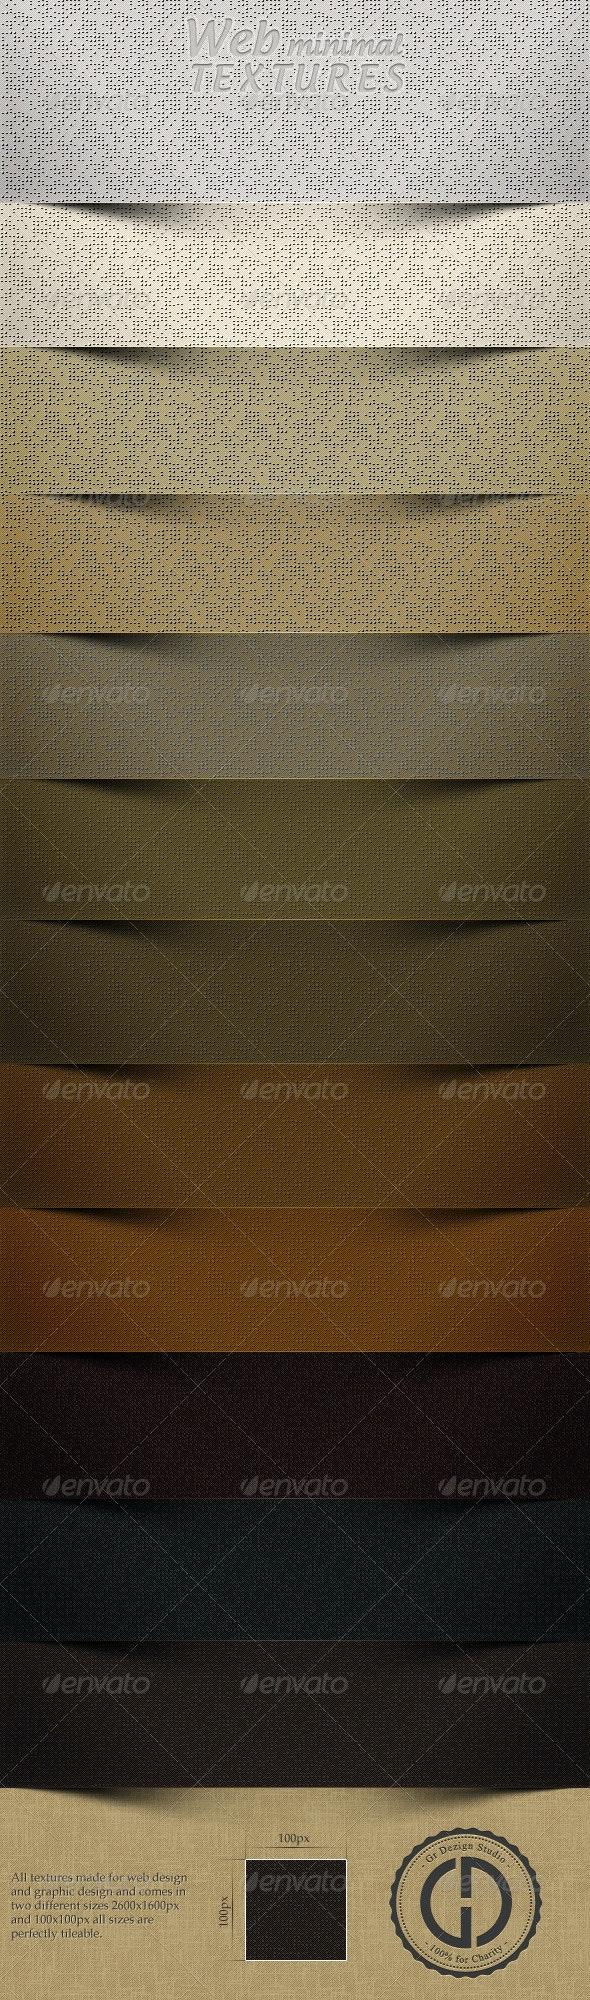 Web Minimal Textures - Industrial / Grunge Textures